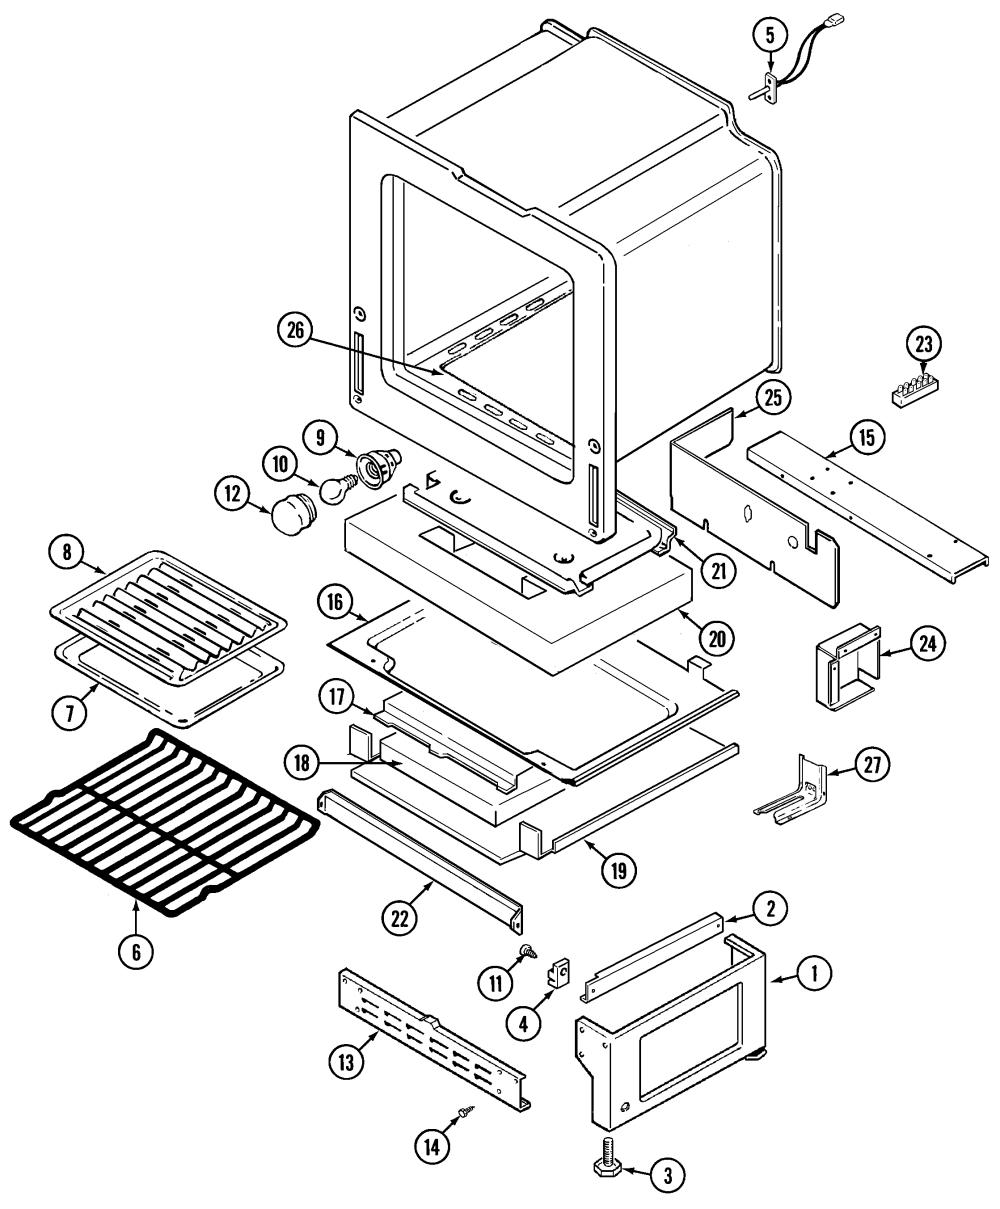 medium resolution of crg9700cae range oven base parts diagram